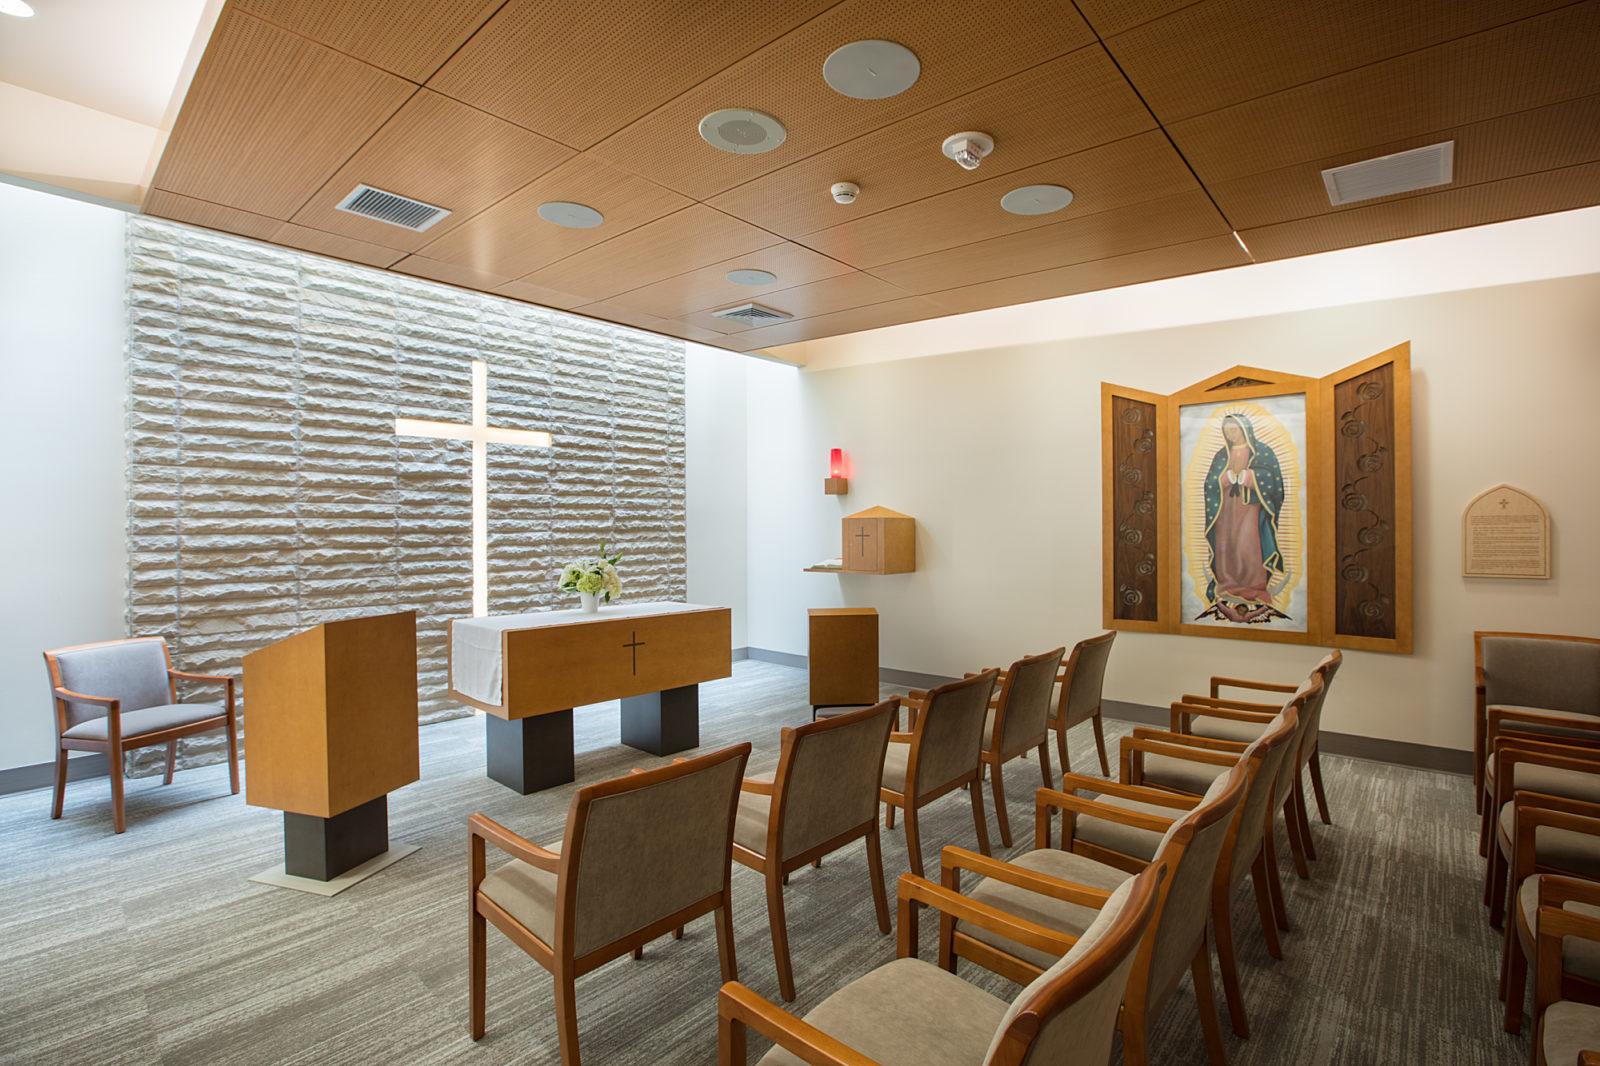 Saint Al Hospital Chapel